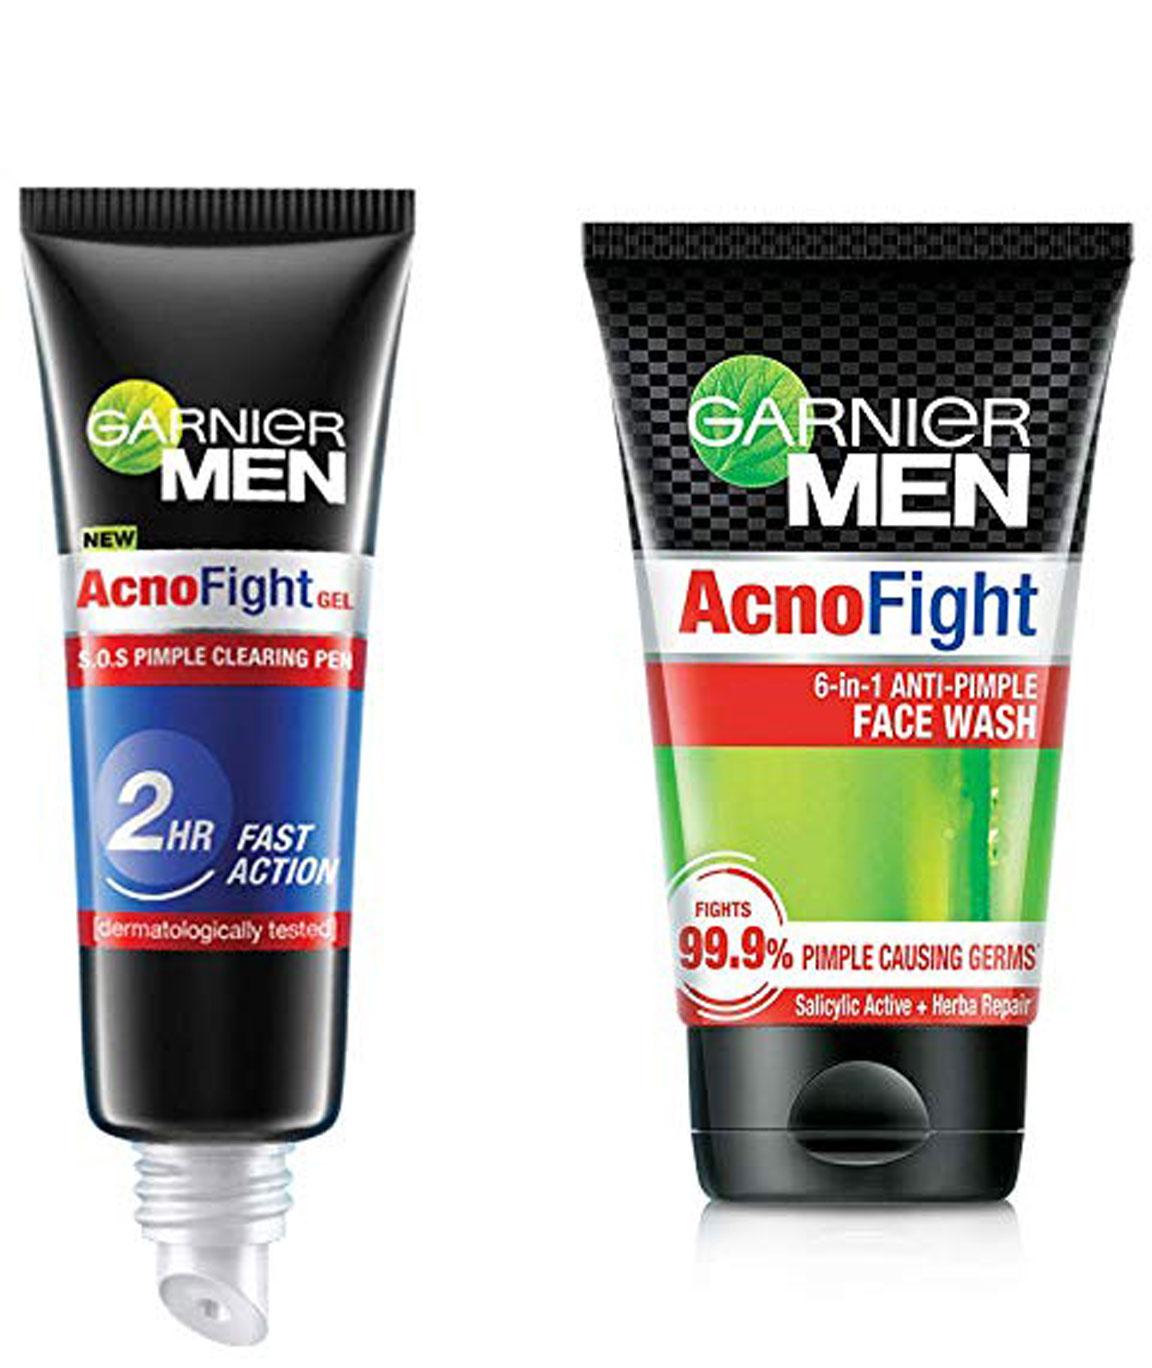 Garnier Men Acno Fight Pimple Clearing Gel,10 ml and Garnier Acno Fight Face Wash for Men, 100 gm